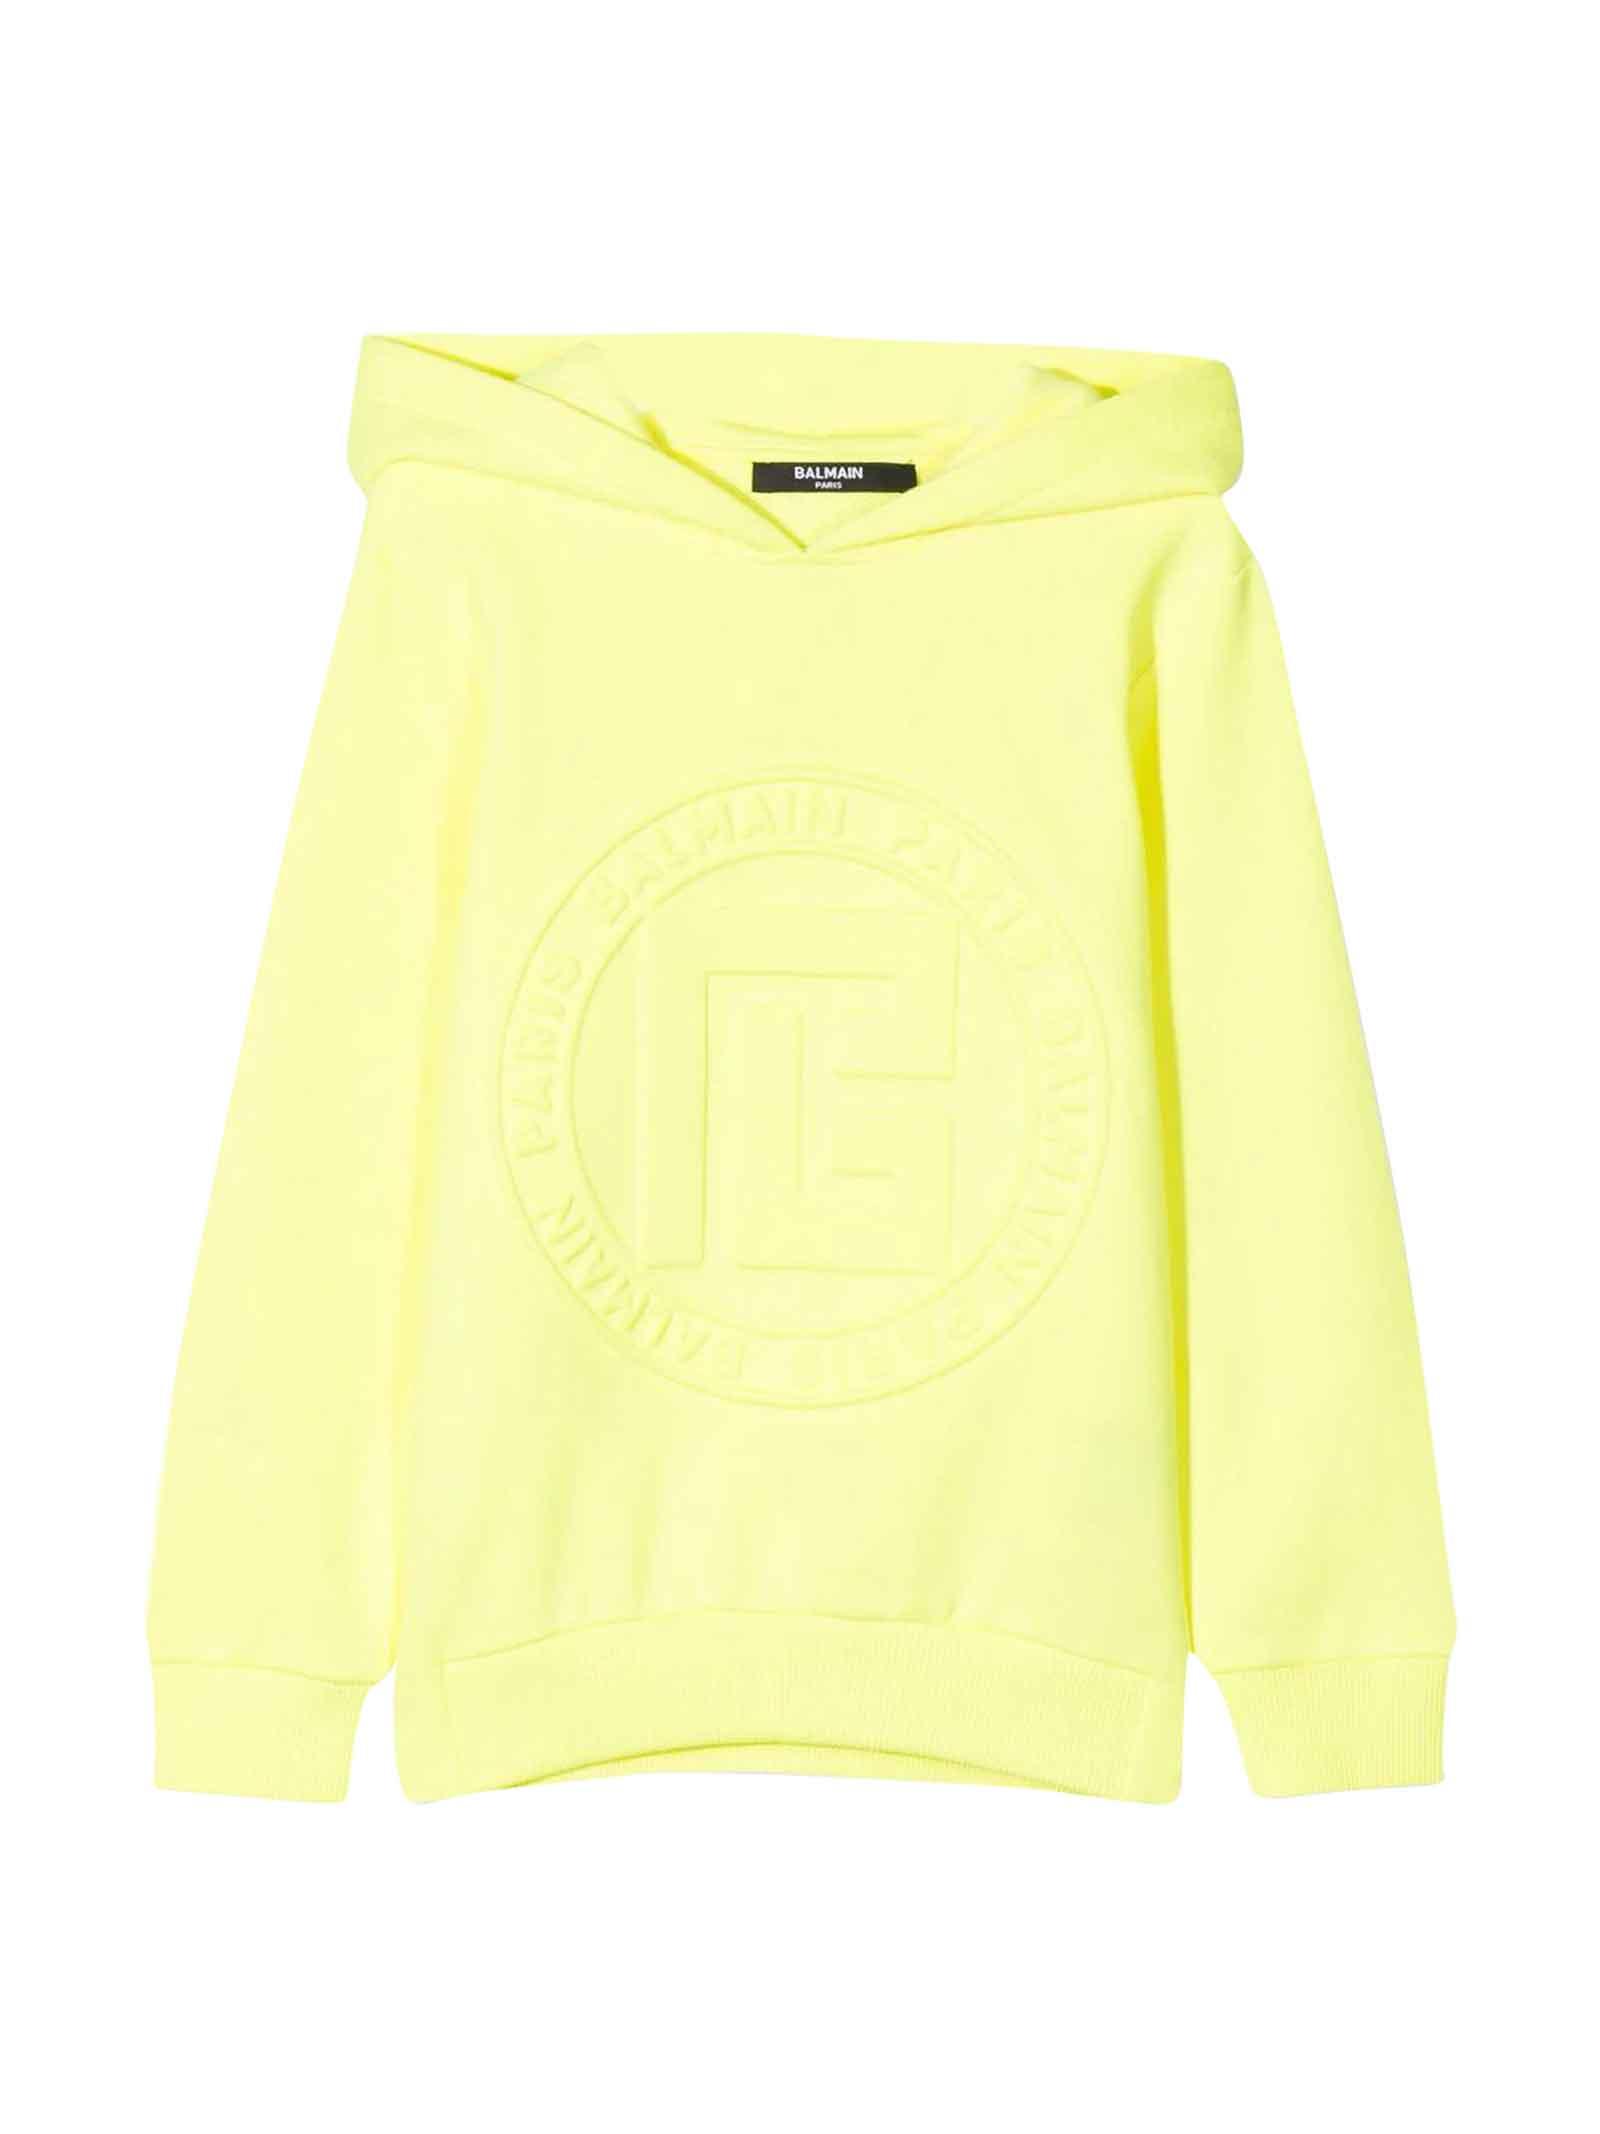 Balmain Kids' Unisex Yellow Sweatshirt In Gialla